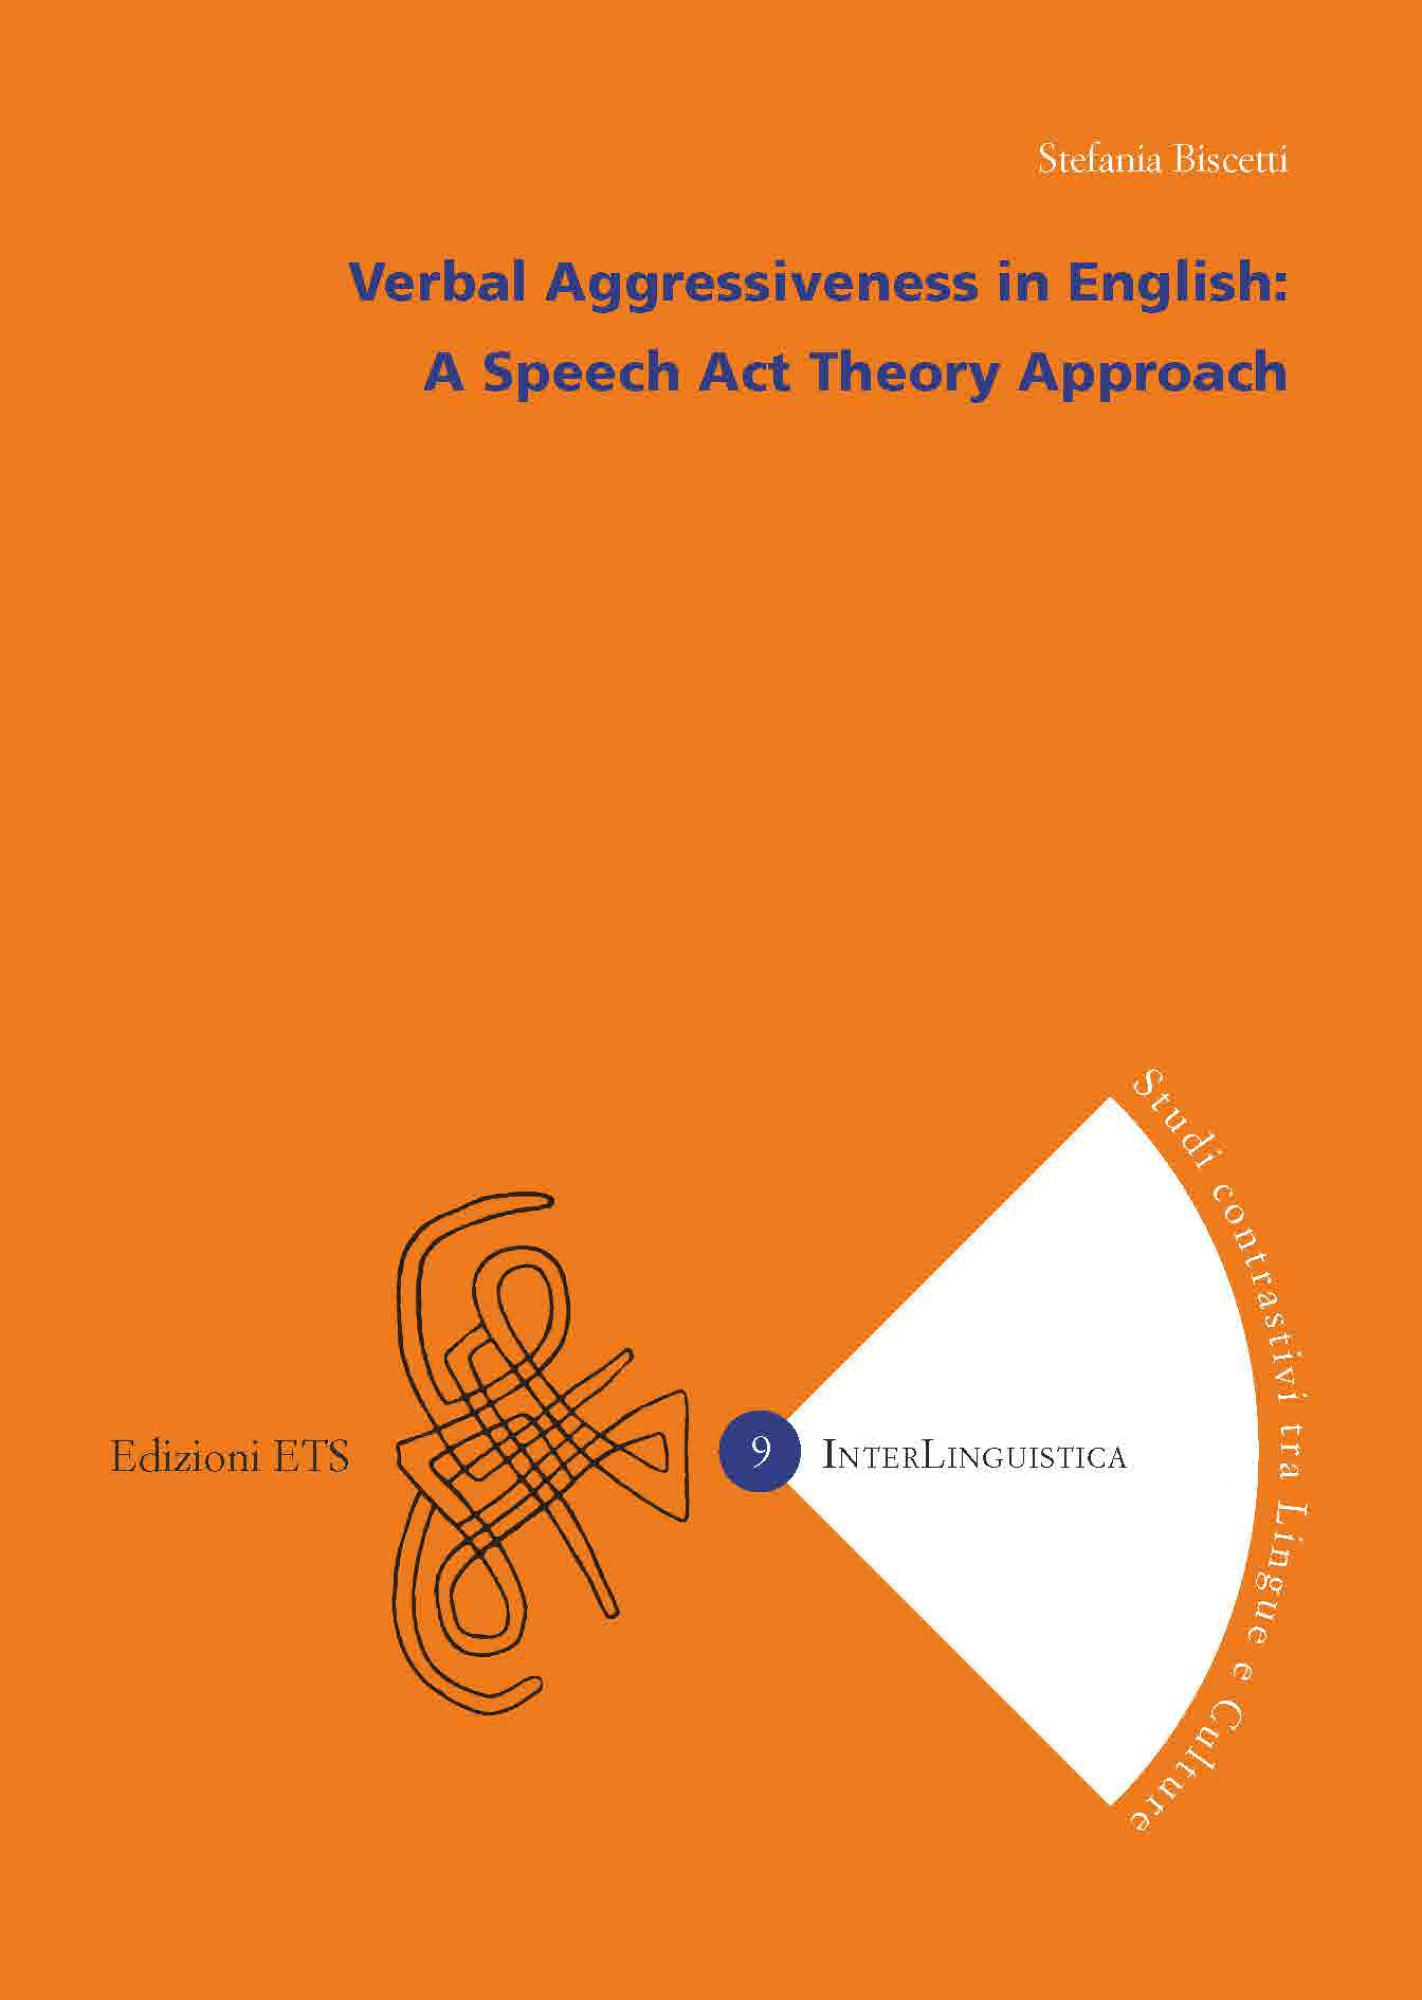 Verbal Aggressiveness in English - <em>novità in arrivo</em>.A Speech Act Theory Approach